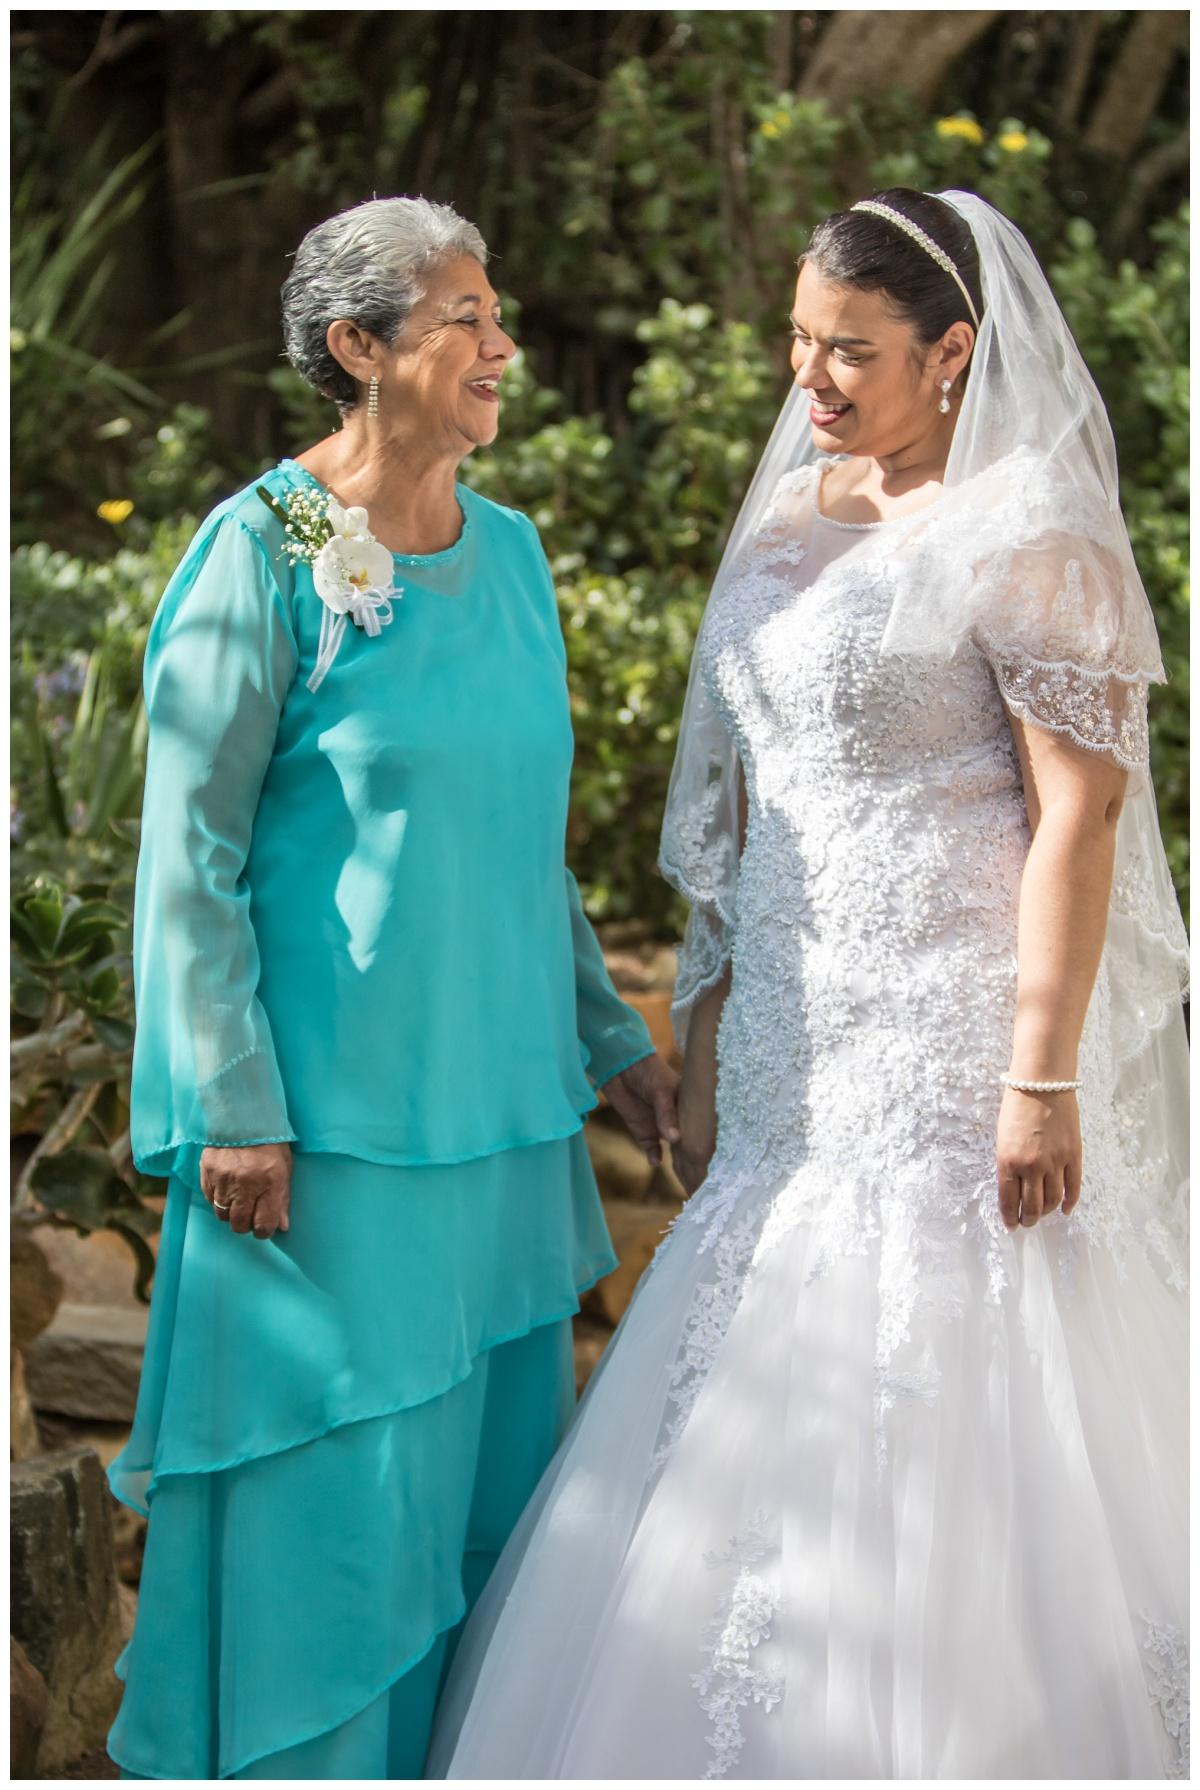 Photography,bridal,bride,canon,groom,photographer,samarendsephoto,wedding,weddingphotography,weddings,